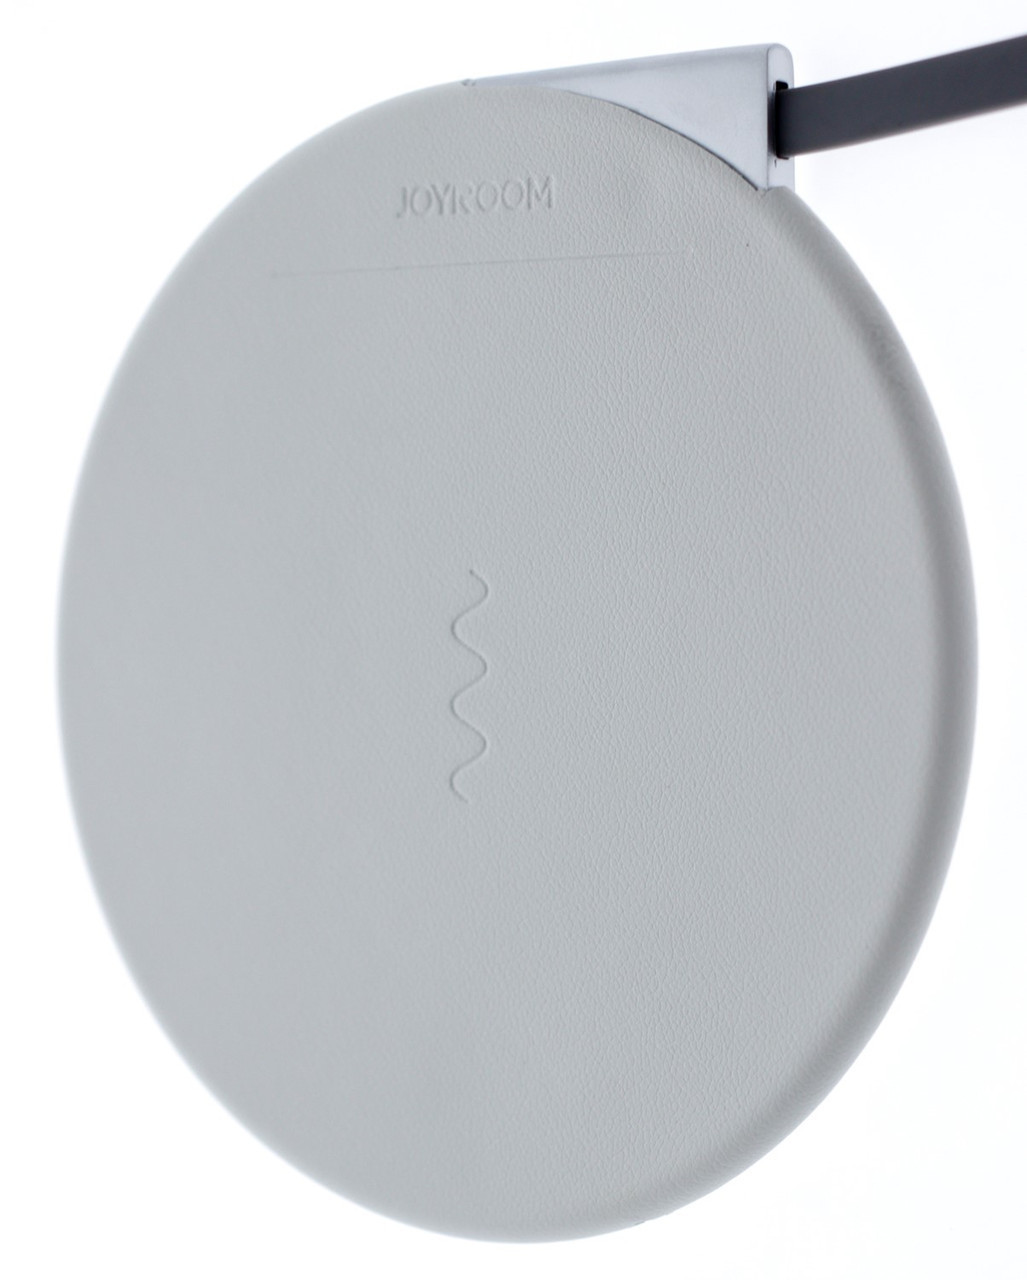 Беспроводное зарядное устройство Joyroom JR-W100 wireless charger (1A) White (VN-0114)